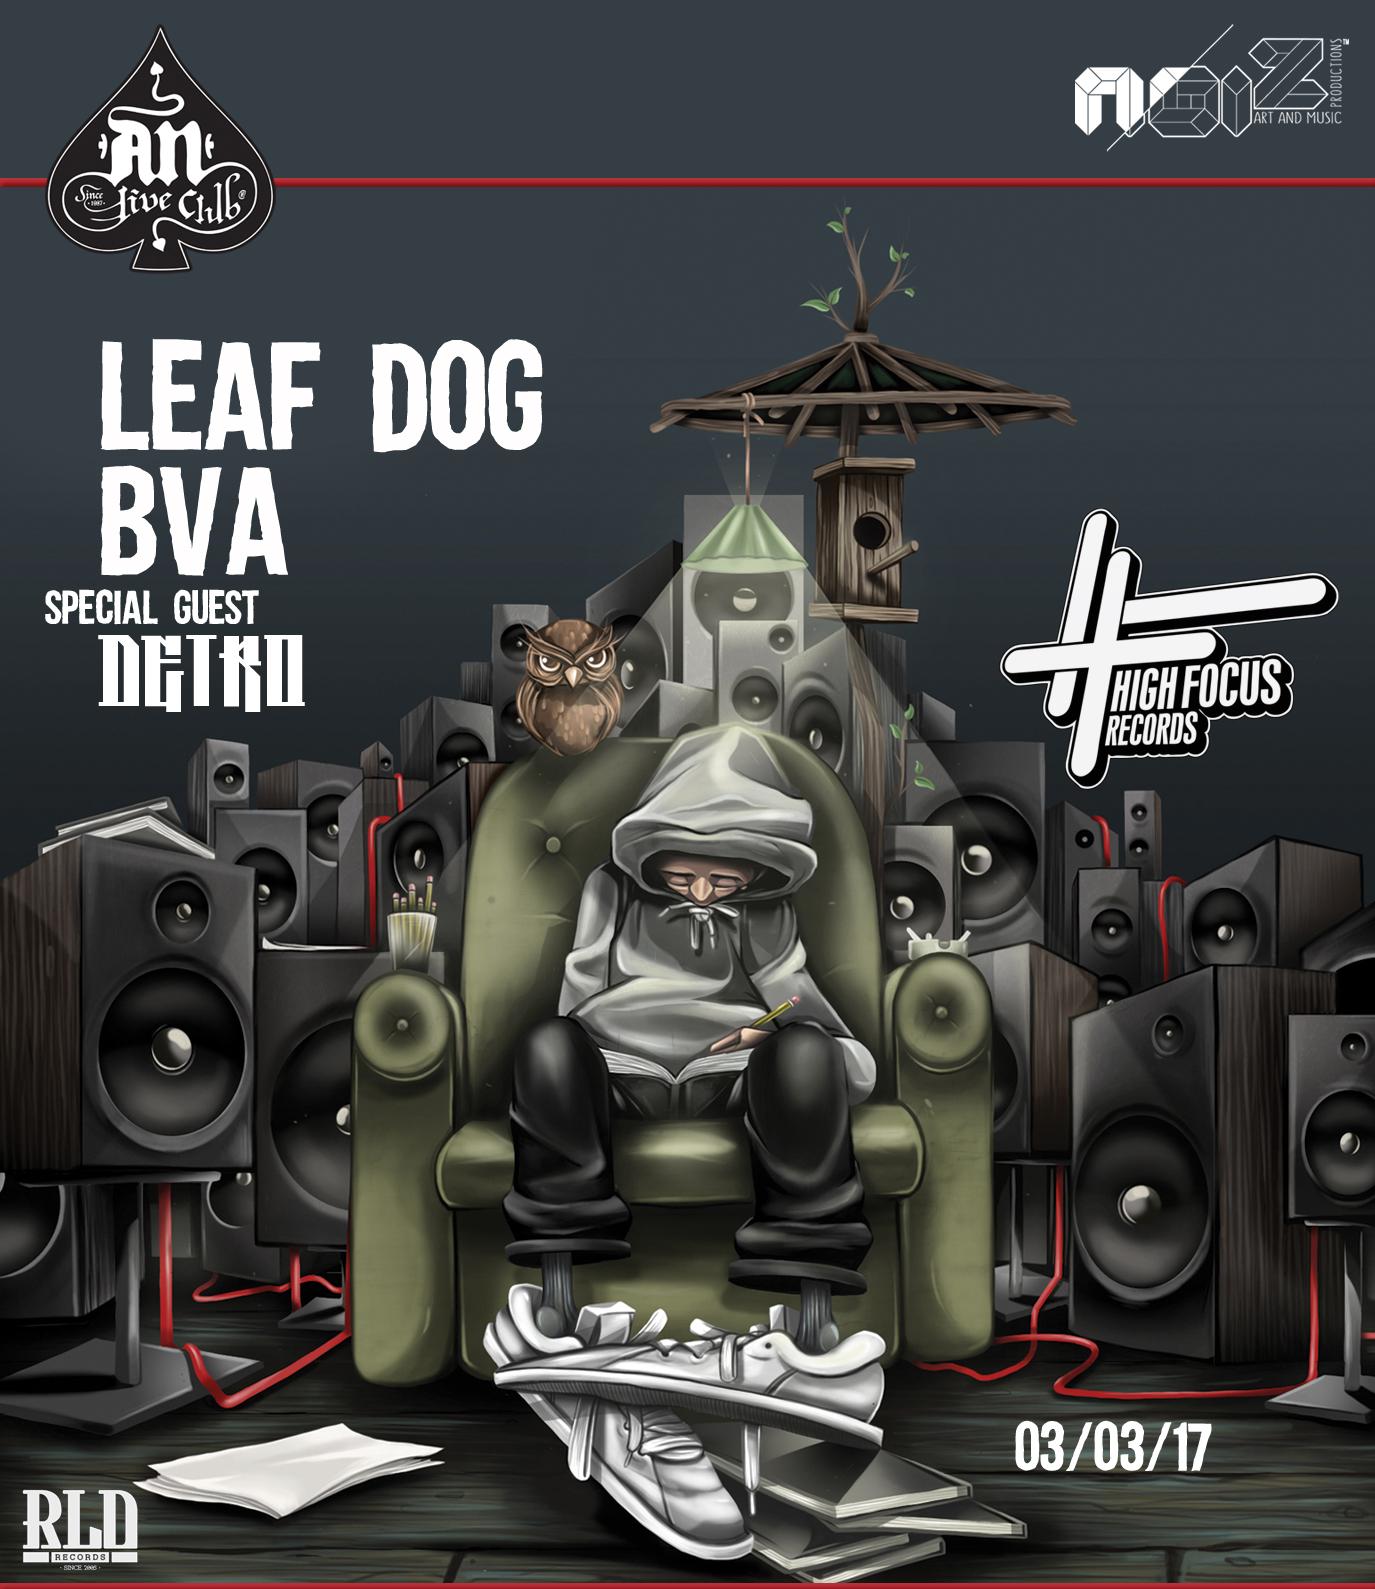 LEAF DOG BVA POSTER.jpg